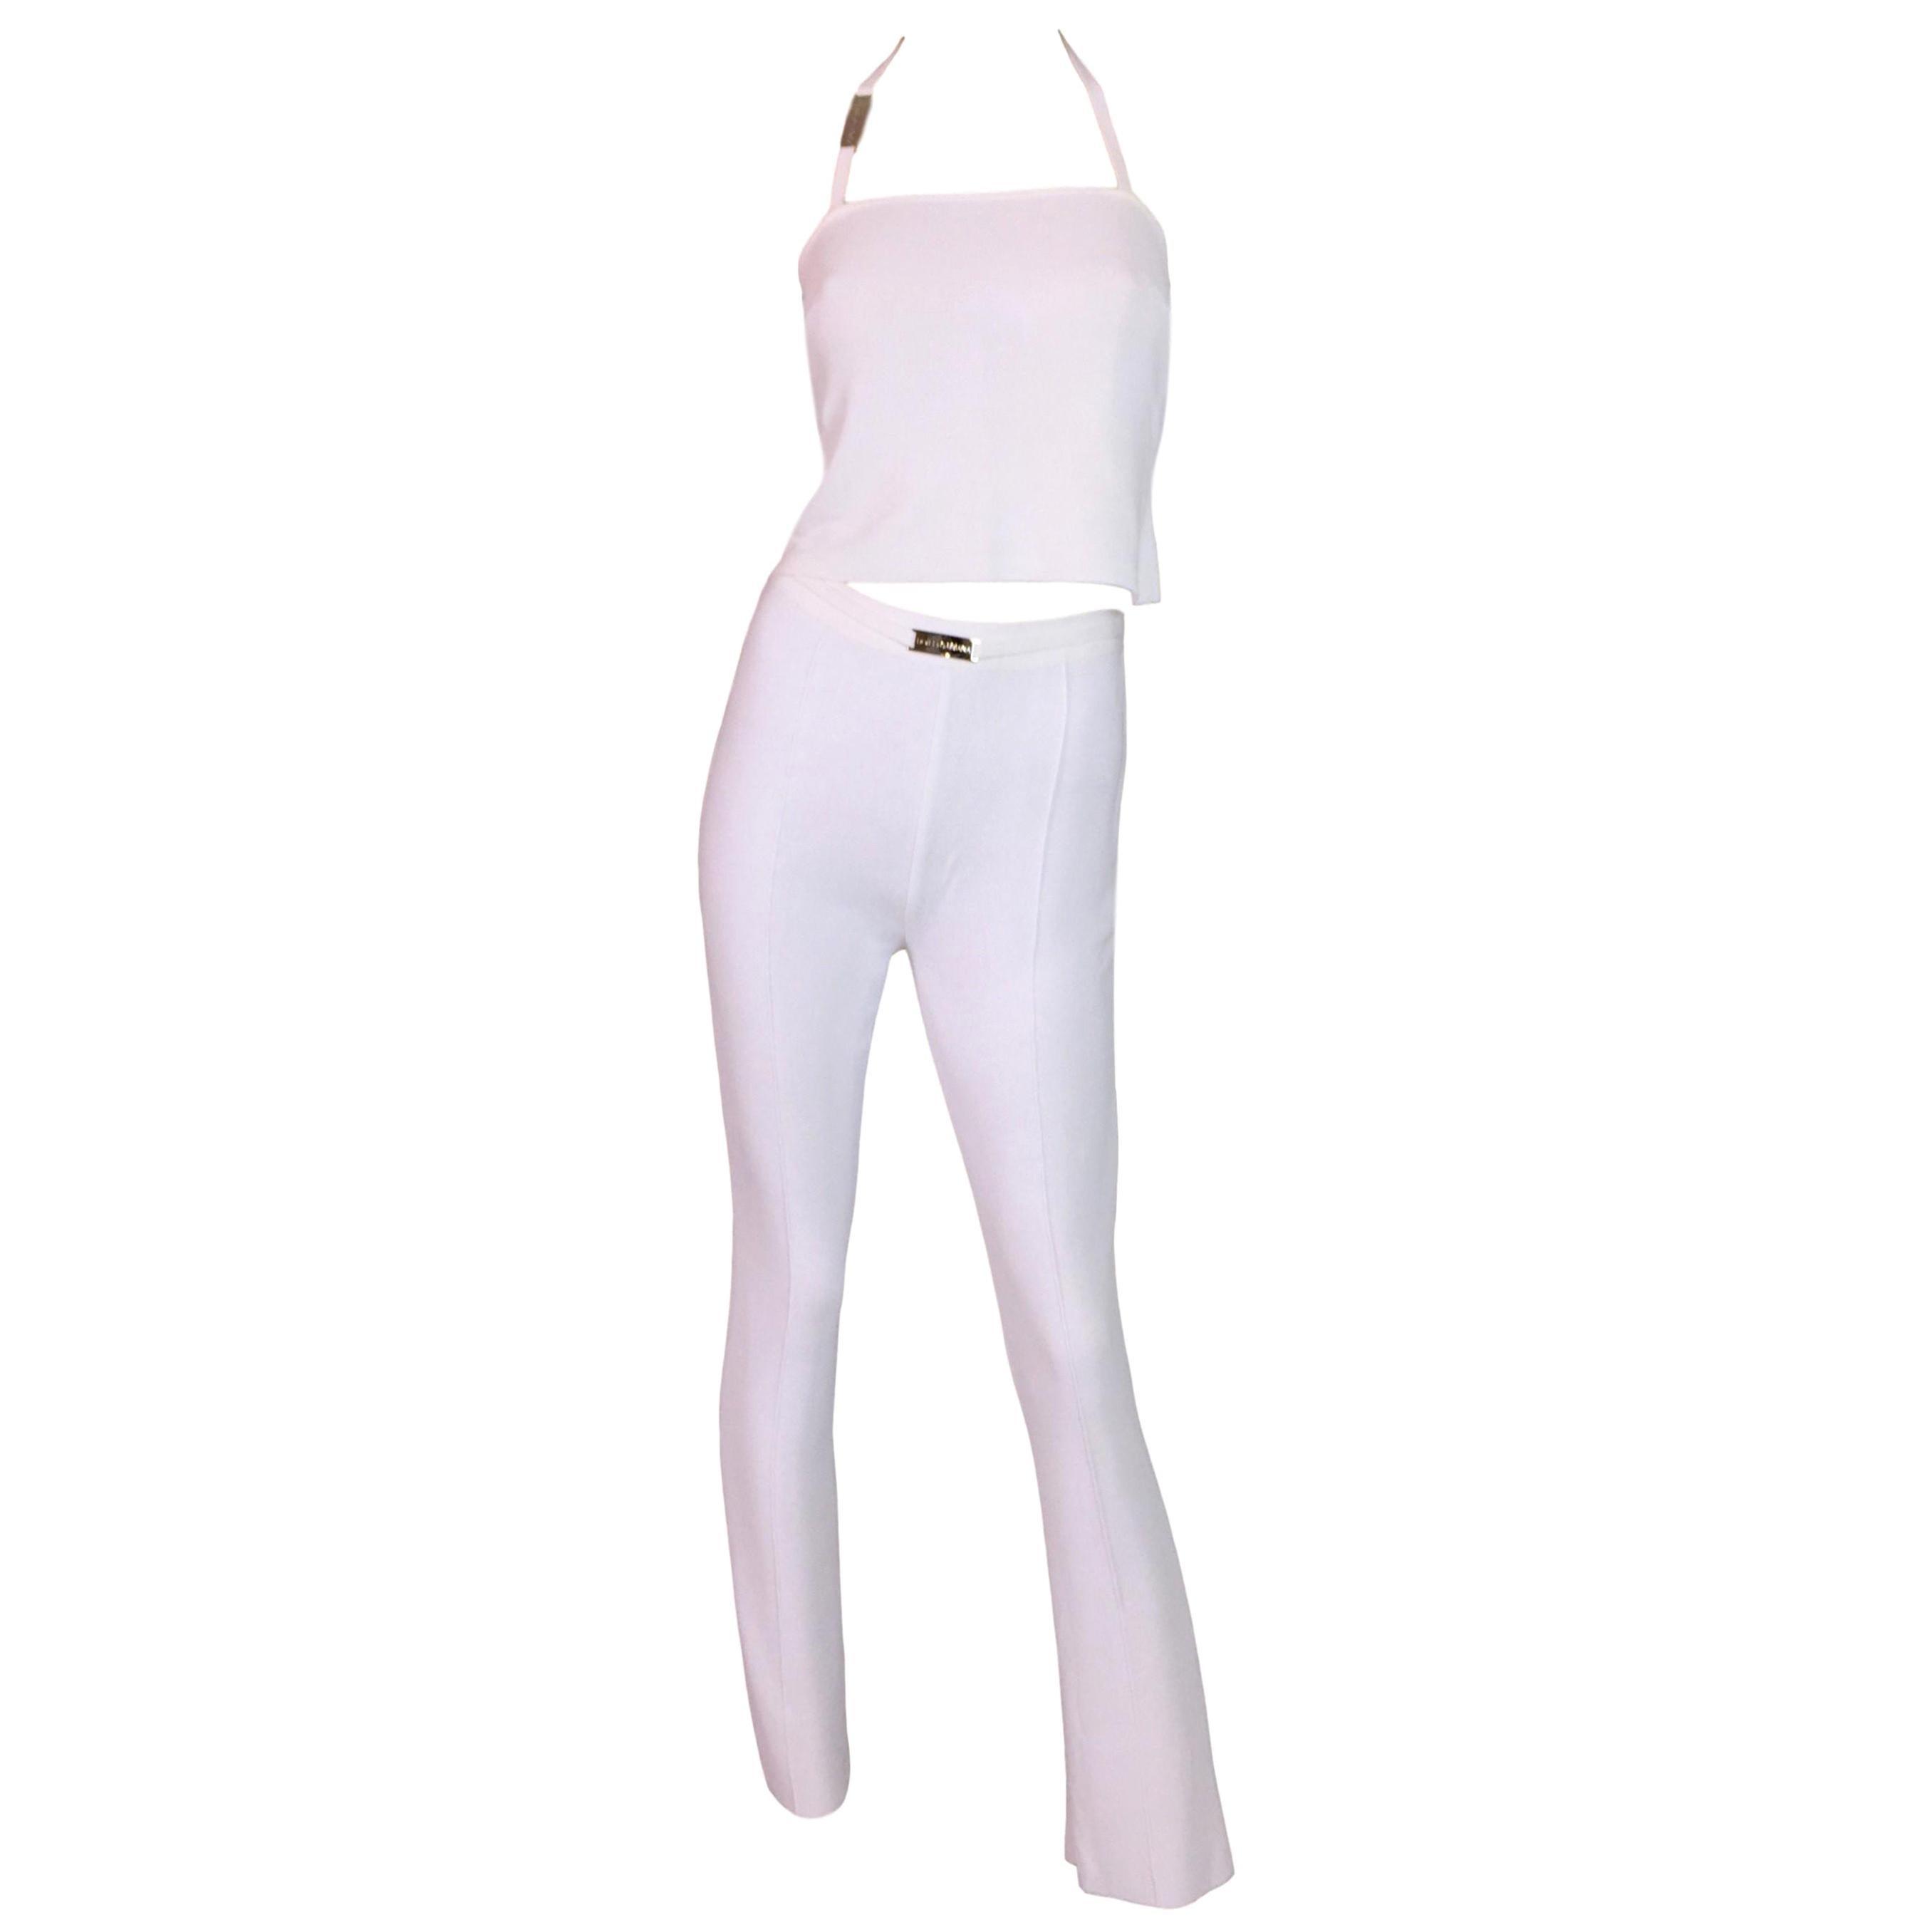 S/S 1995 Dolce & Gabbana Sheer White Knit High Waist Pants & Crop Top Jumpsuit